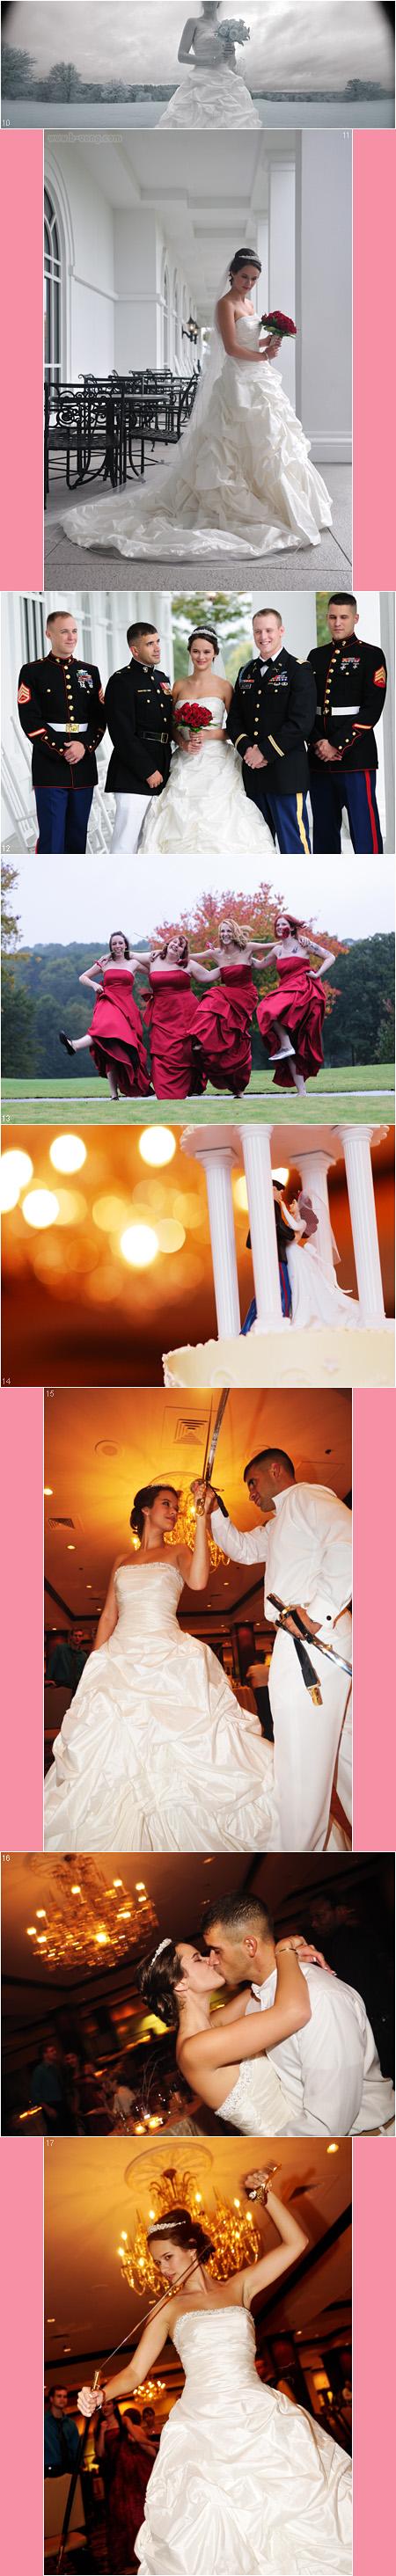 w_b-vong.com_pix_marietta_wedding_2